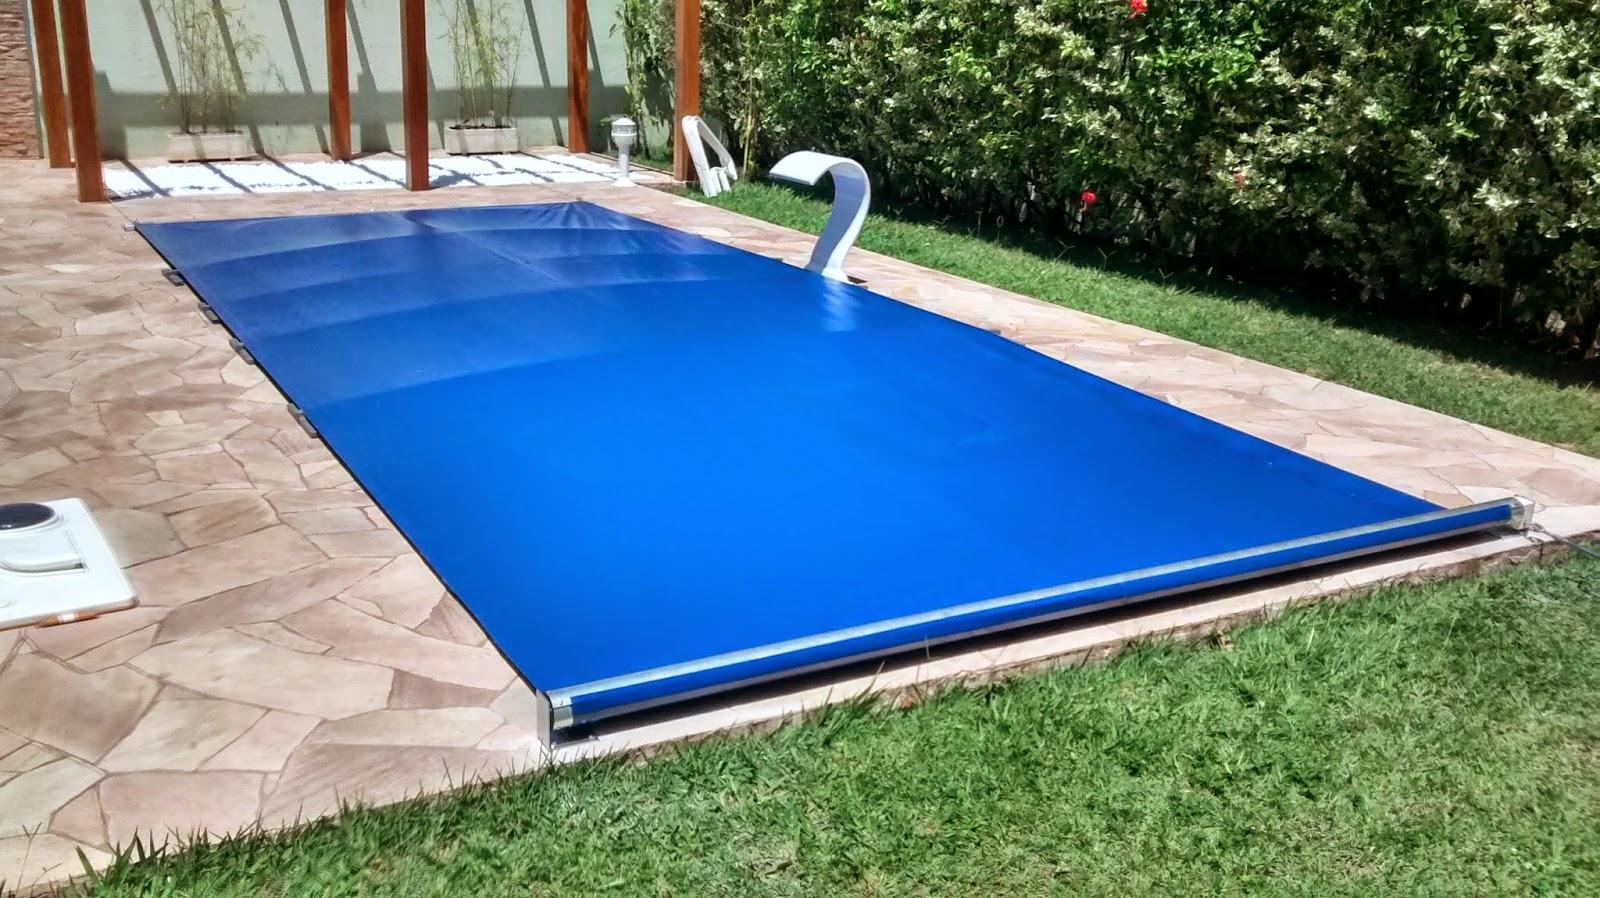 Capa de piscina de enrolar toldos garcia for Fotos de piscinas cubiertas